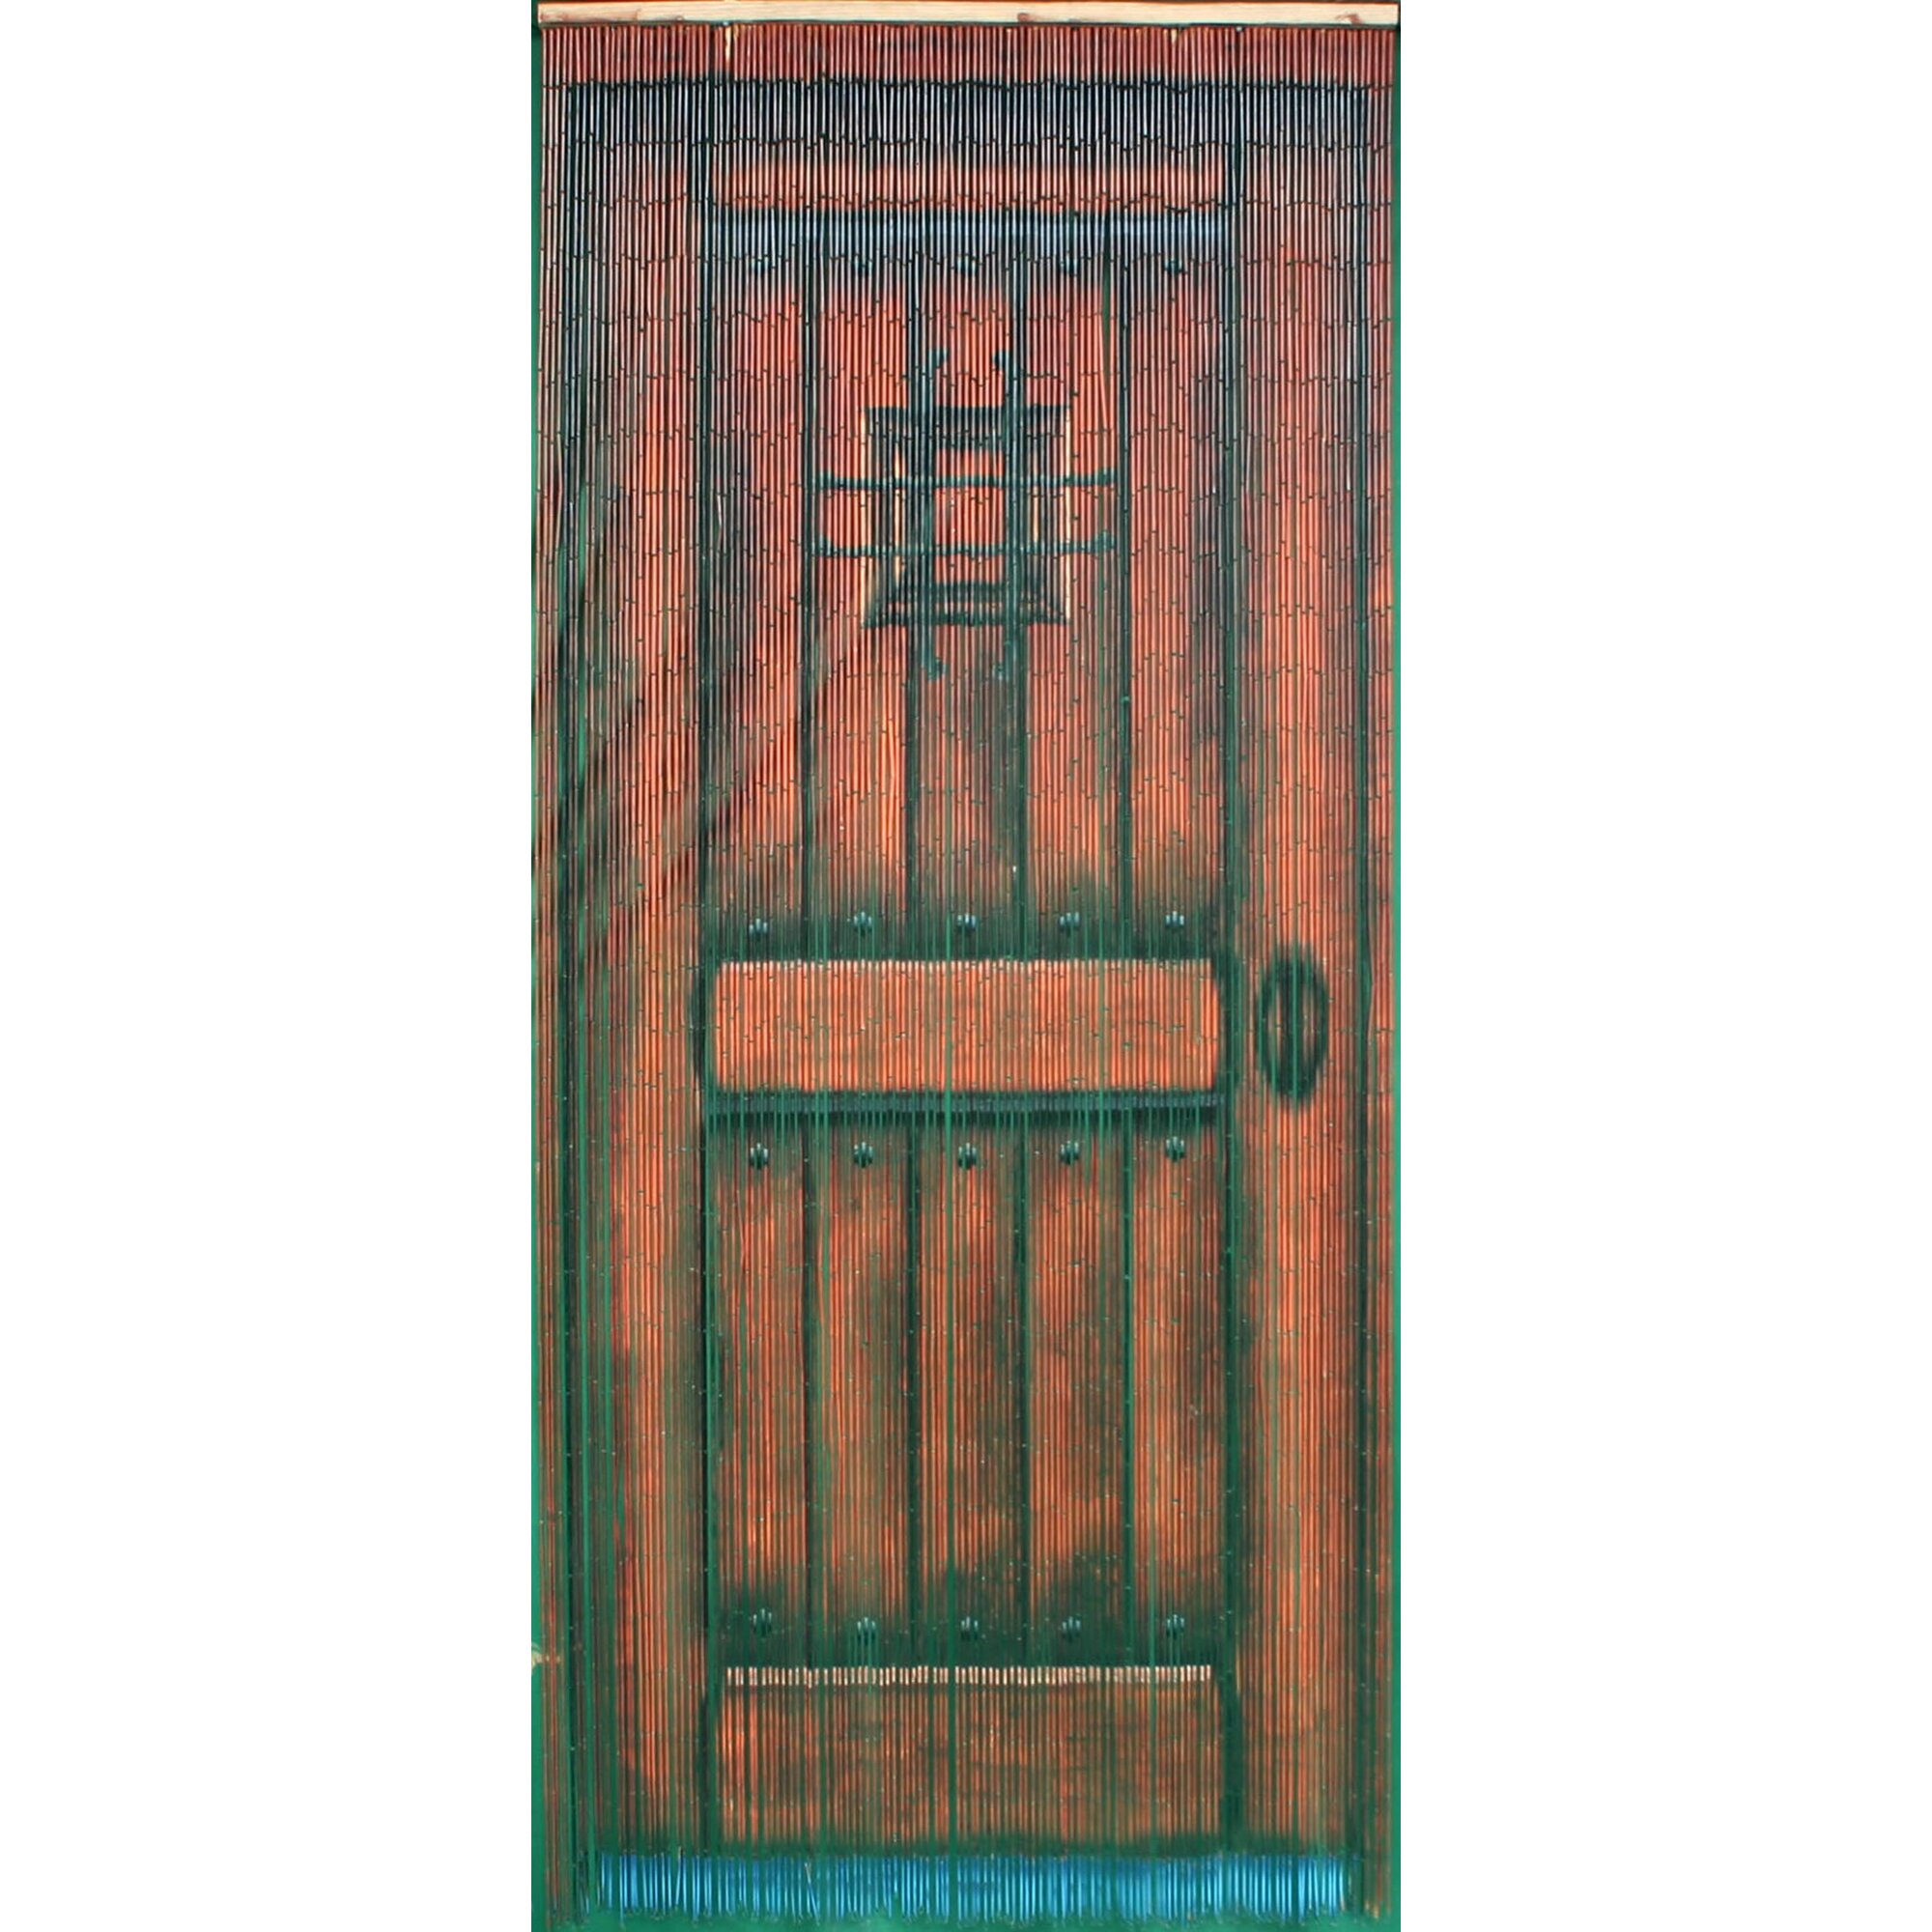 Bamboo54 78 X 36 Bamboo Beaded Curtain Door Motif Room Divider